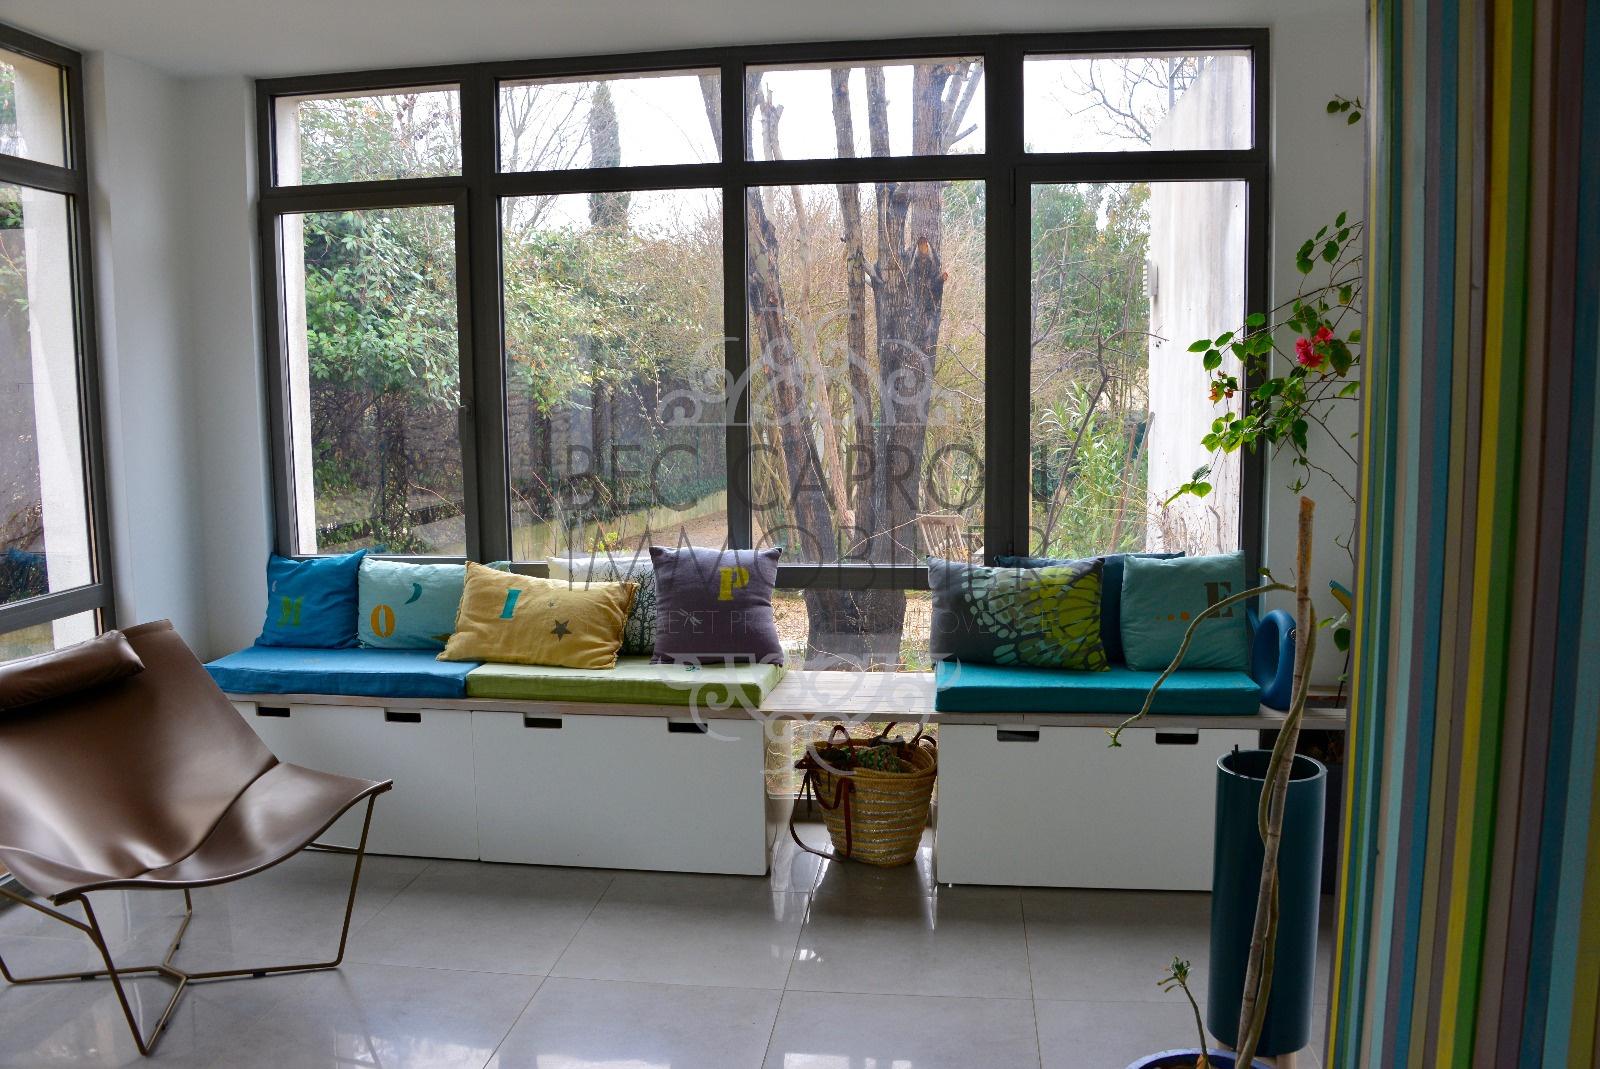 veranda vue sur jardin arboré